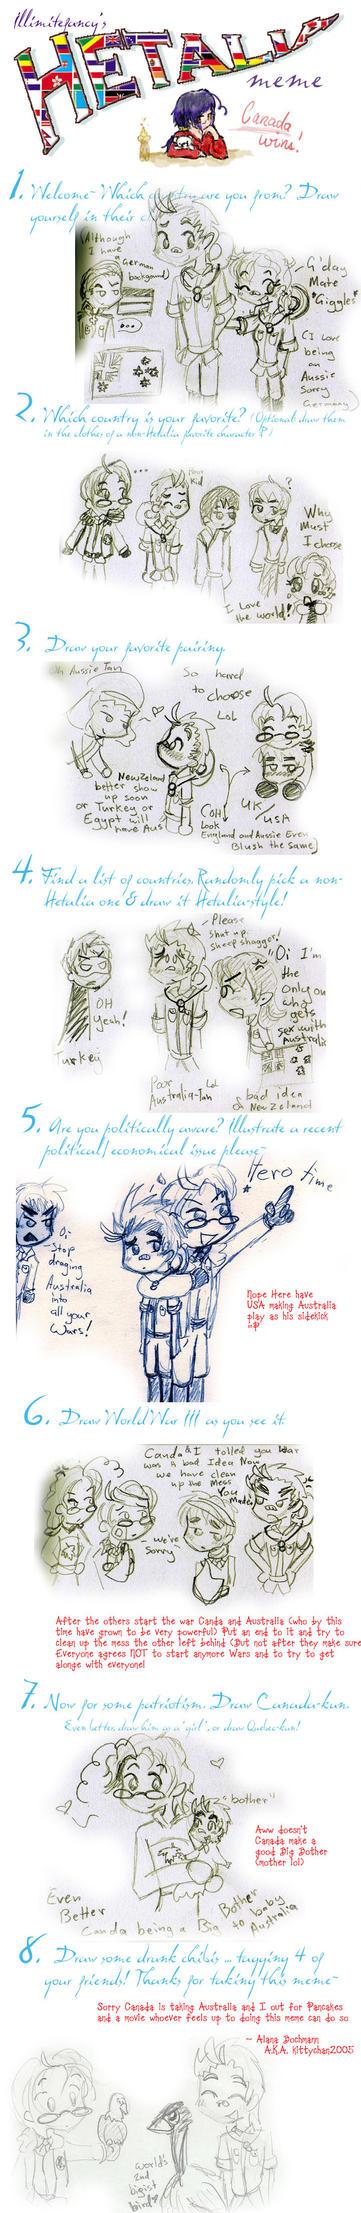 APH Meme by Kittychan2005